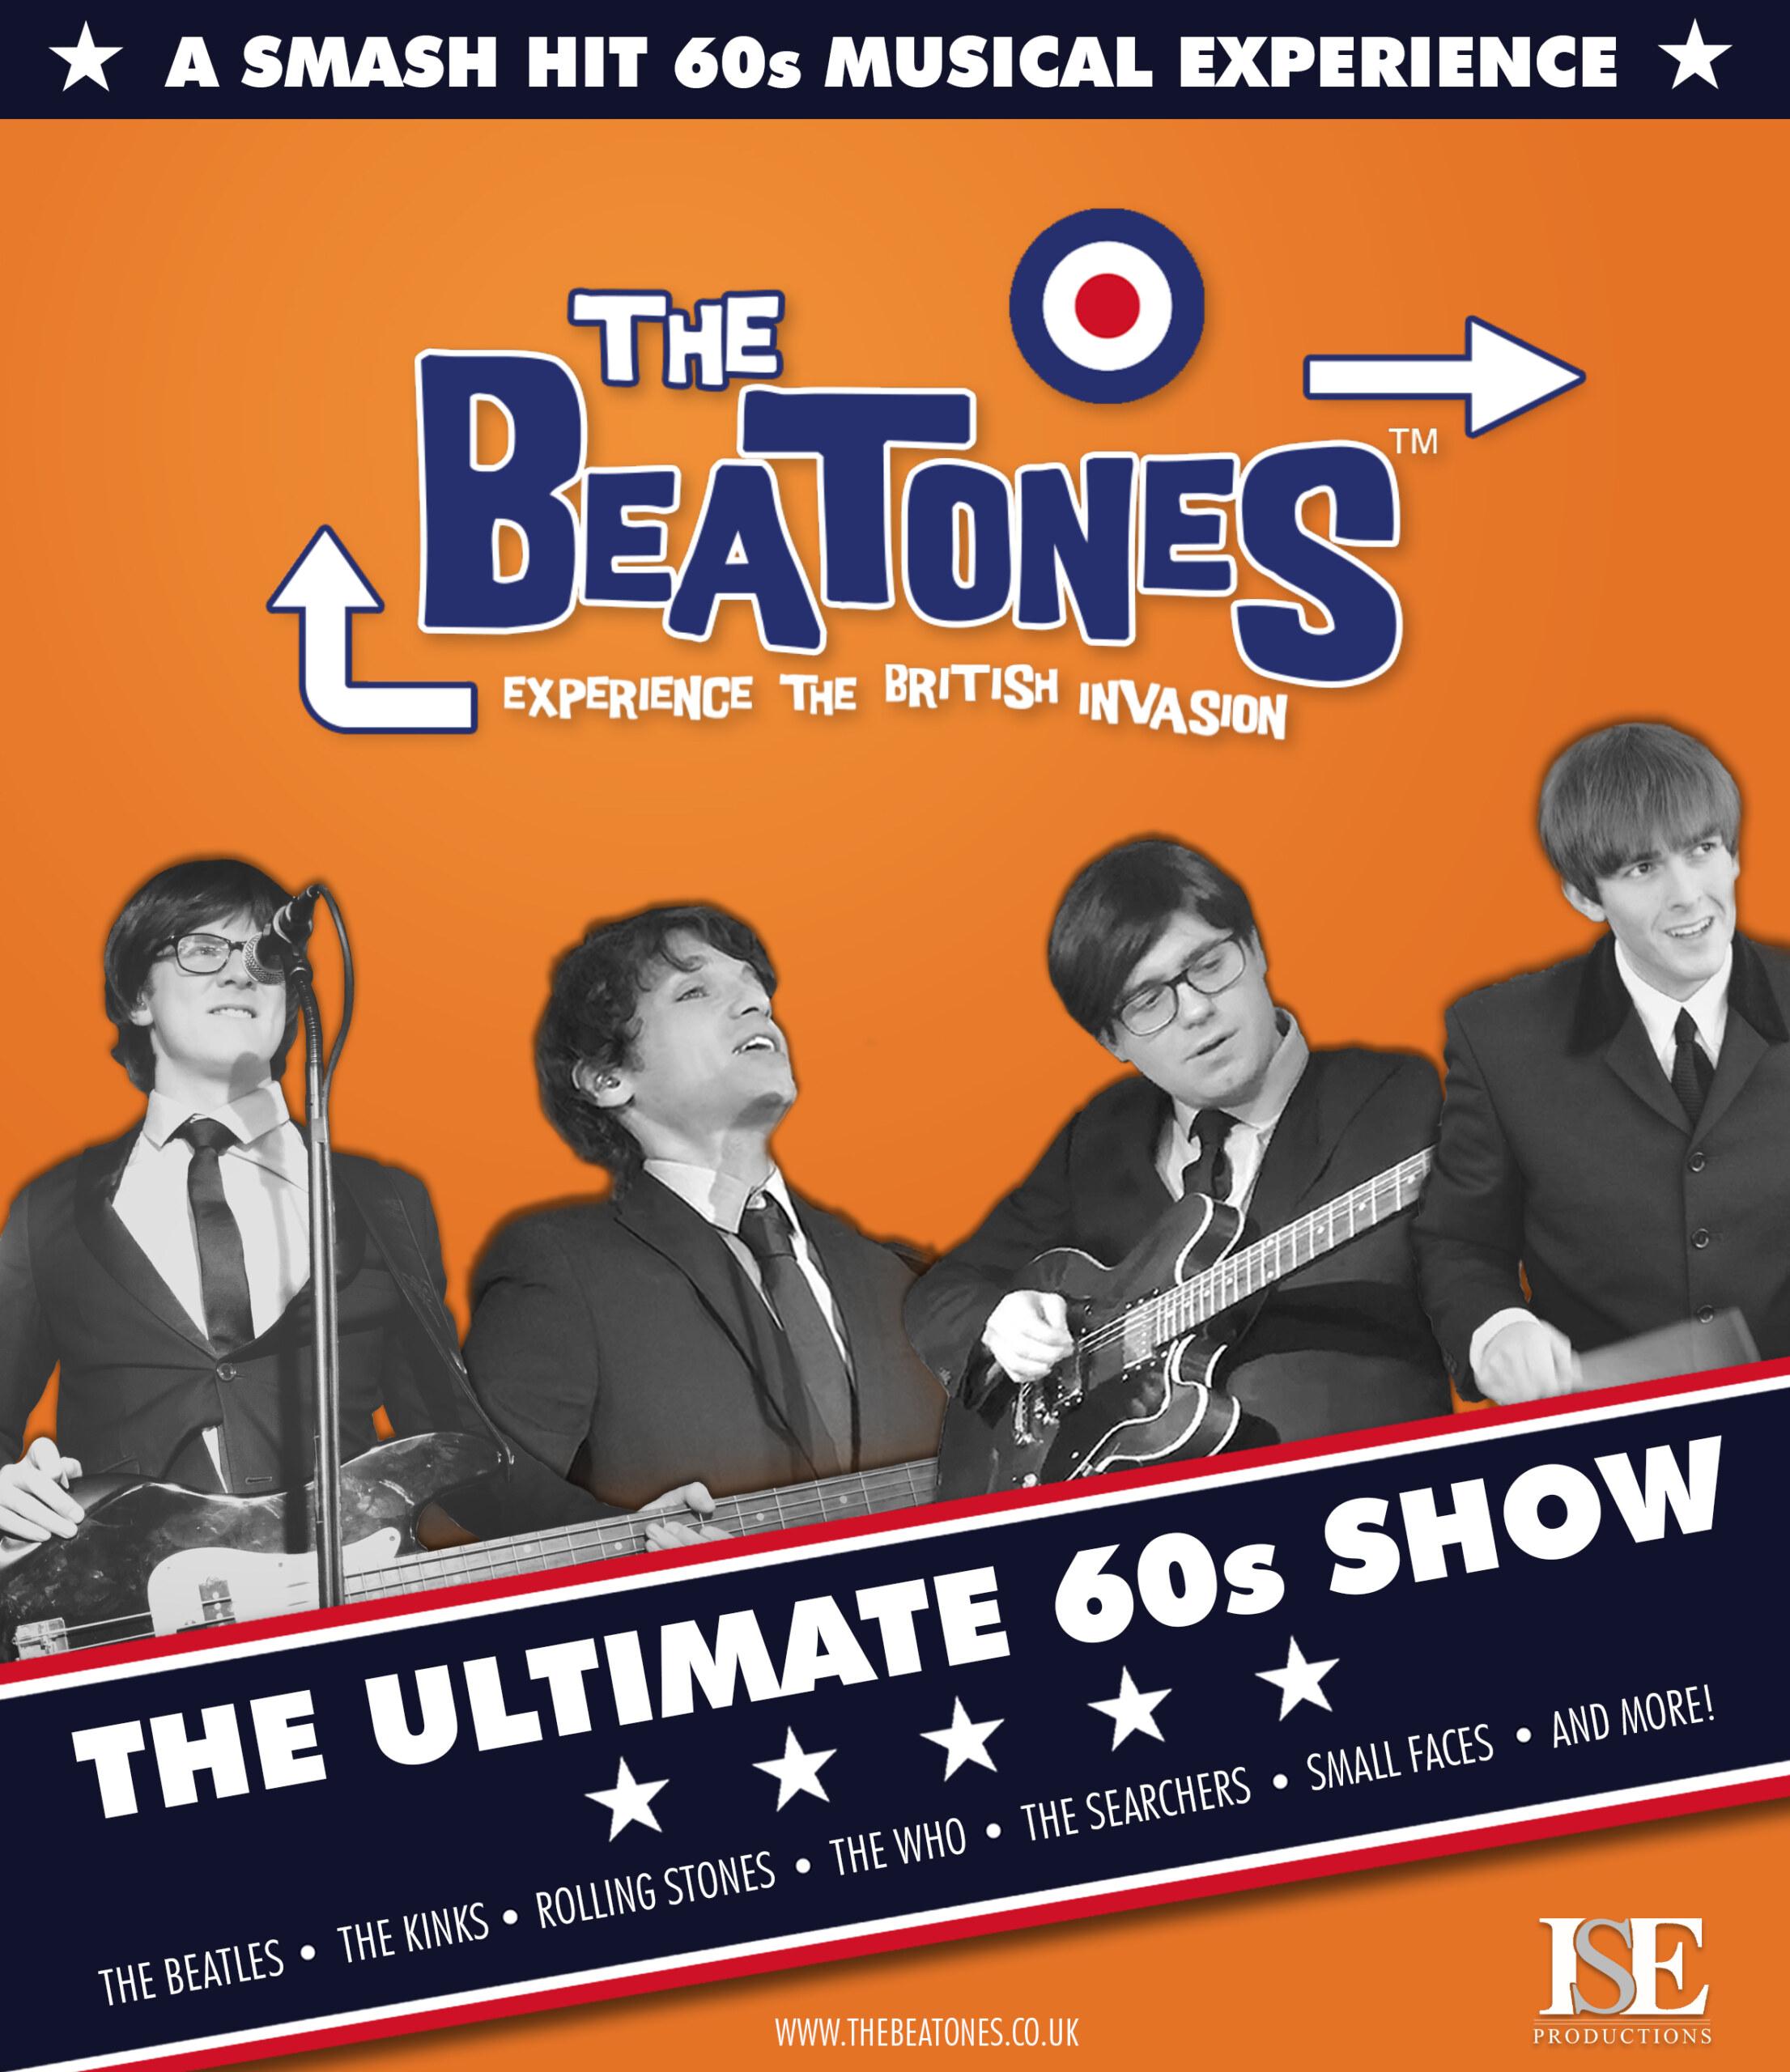 The Beatones-Experience The British Invasion